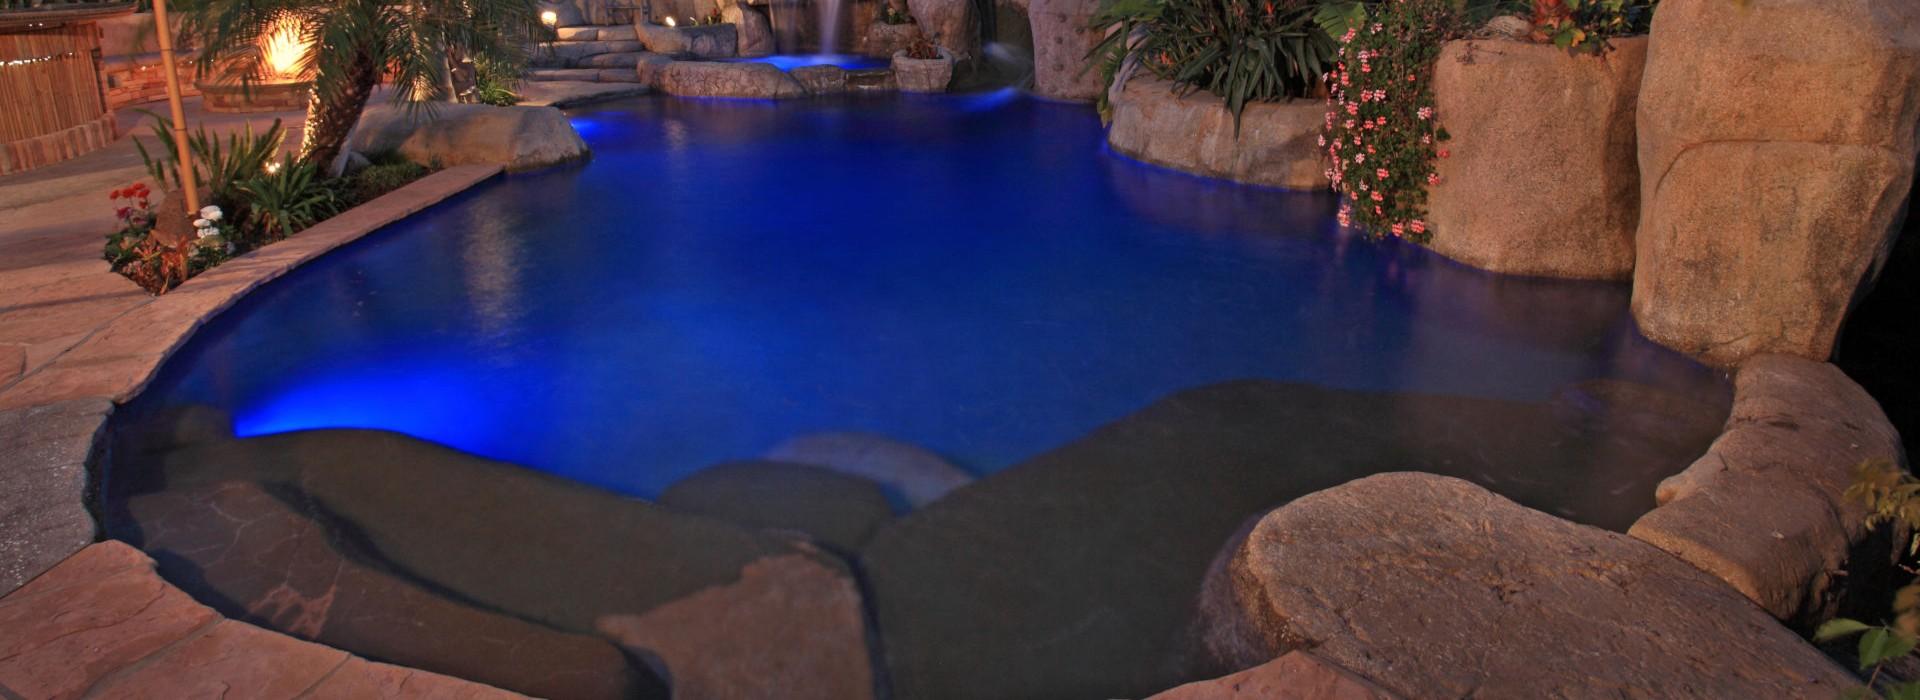 blue-lagoon-banner-1-1.jpg